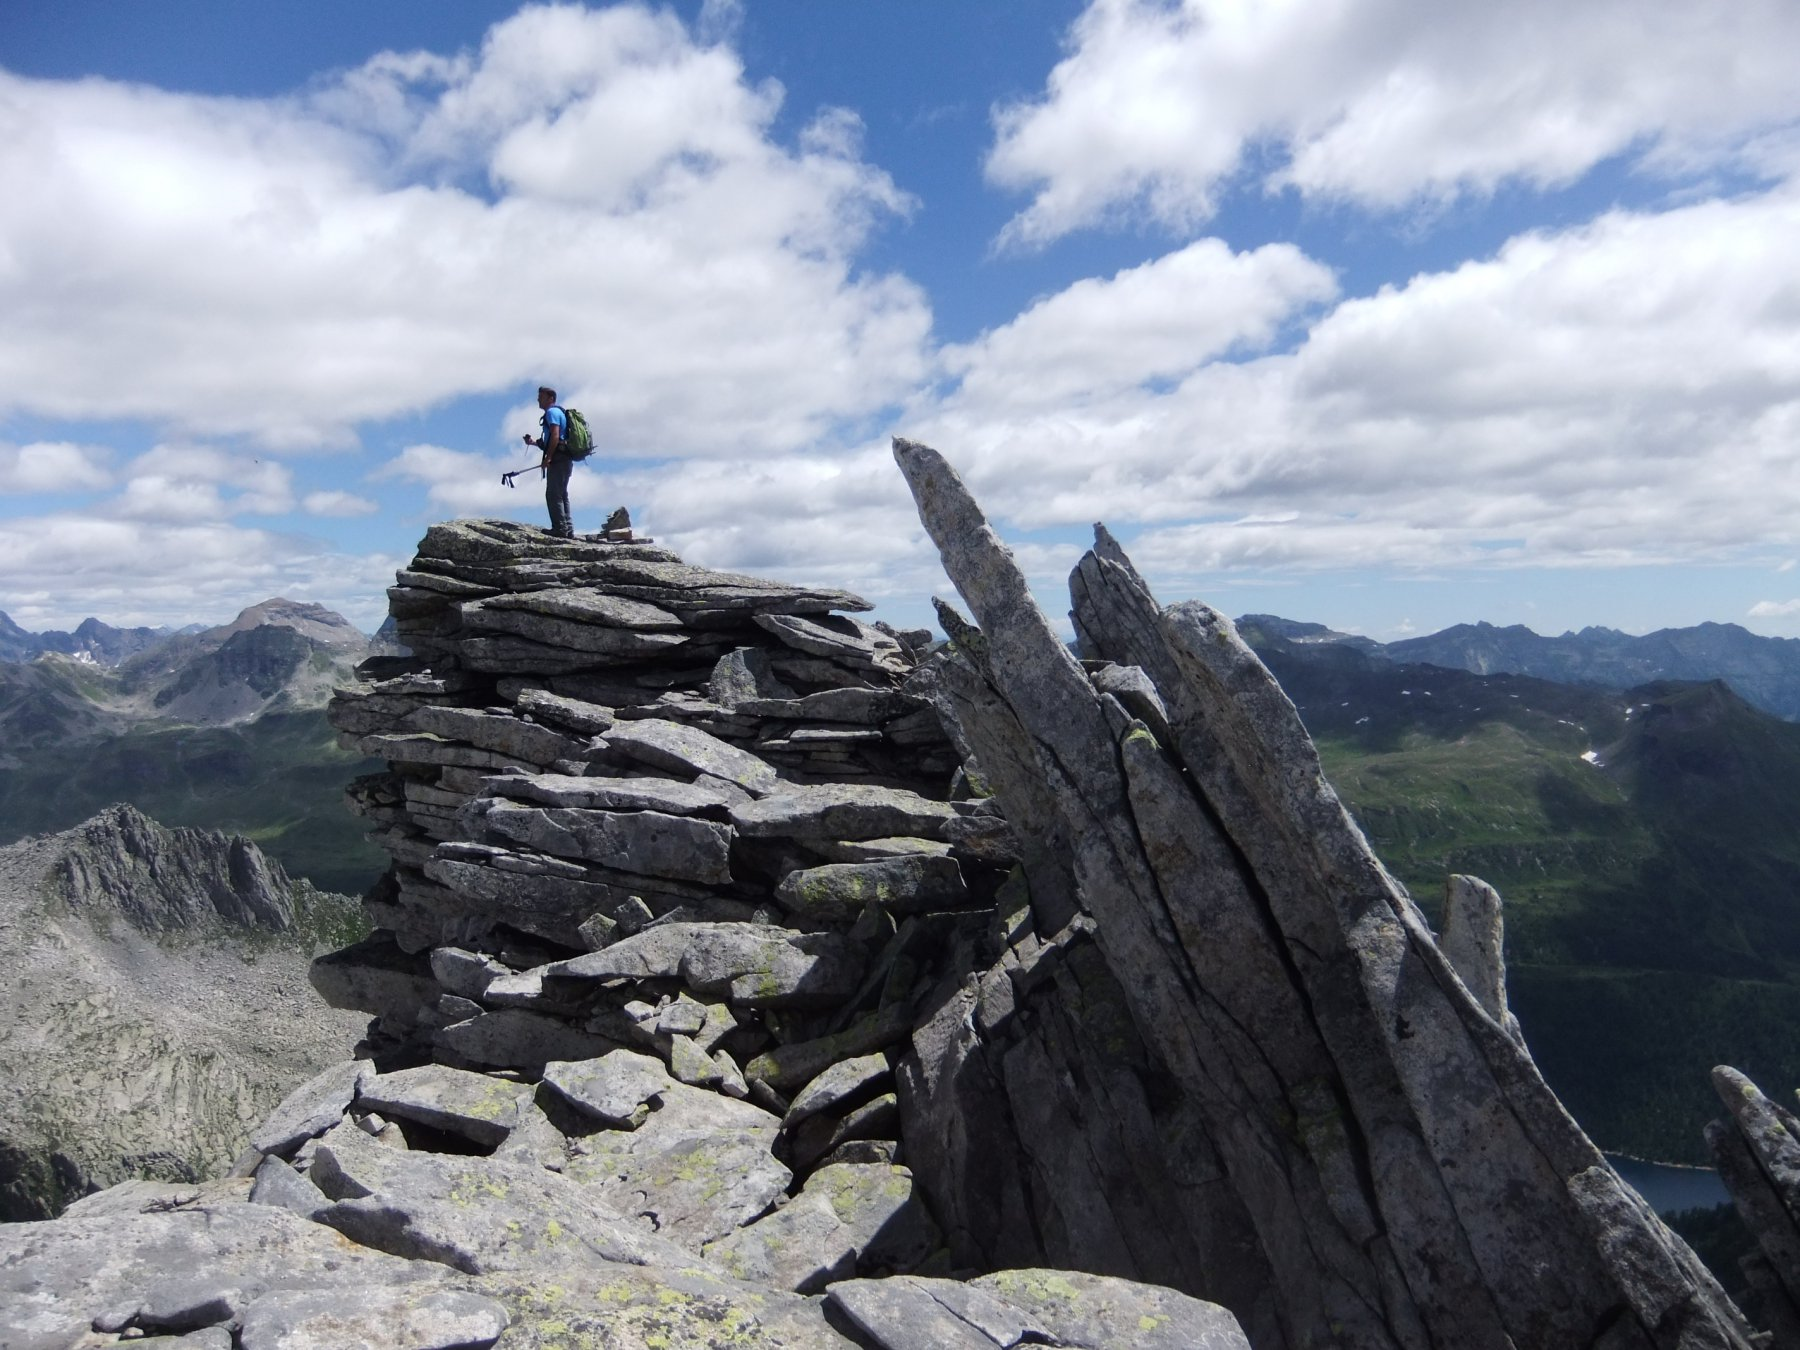 La cima sud del Geisspfadspitzen